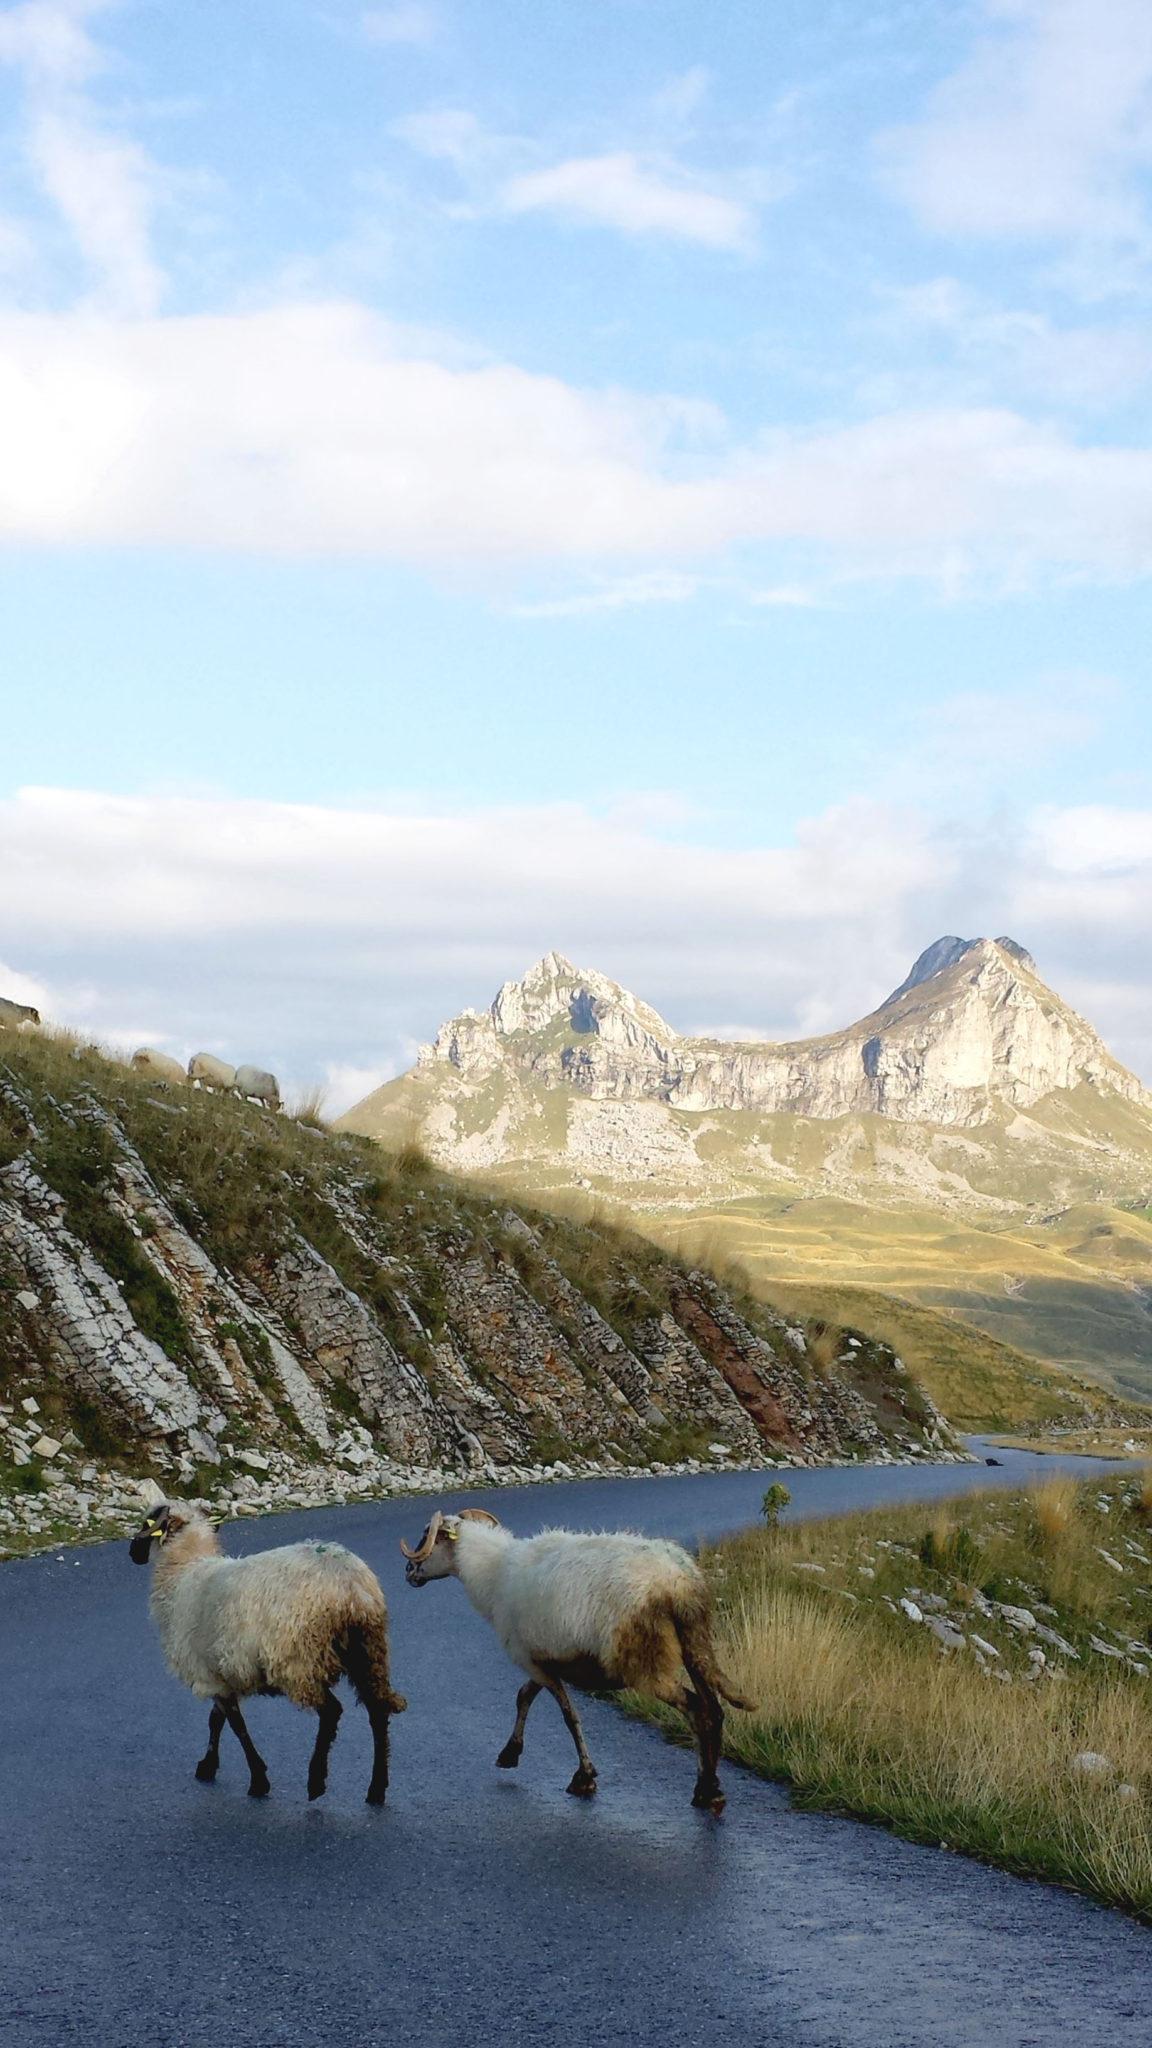 Hemaposesesvalises_vers_le_parc_de_durmitor_trsa_travel_voyage_blog14